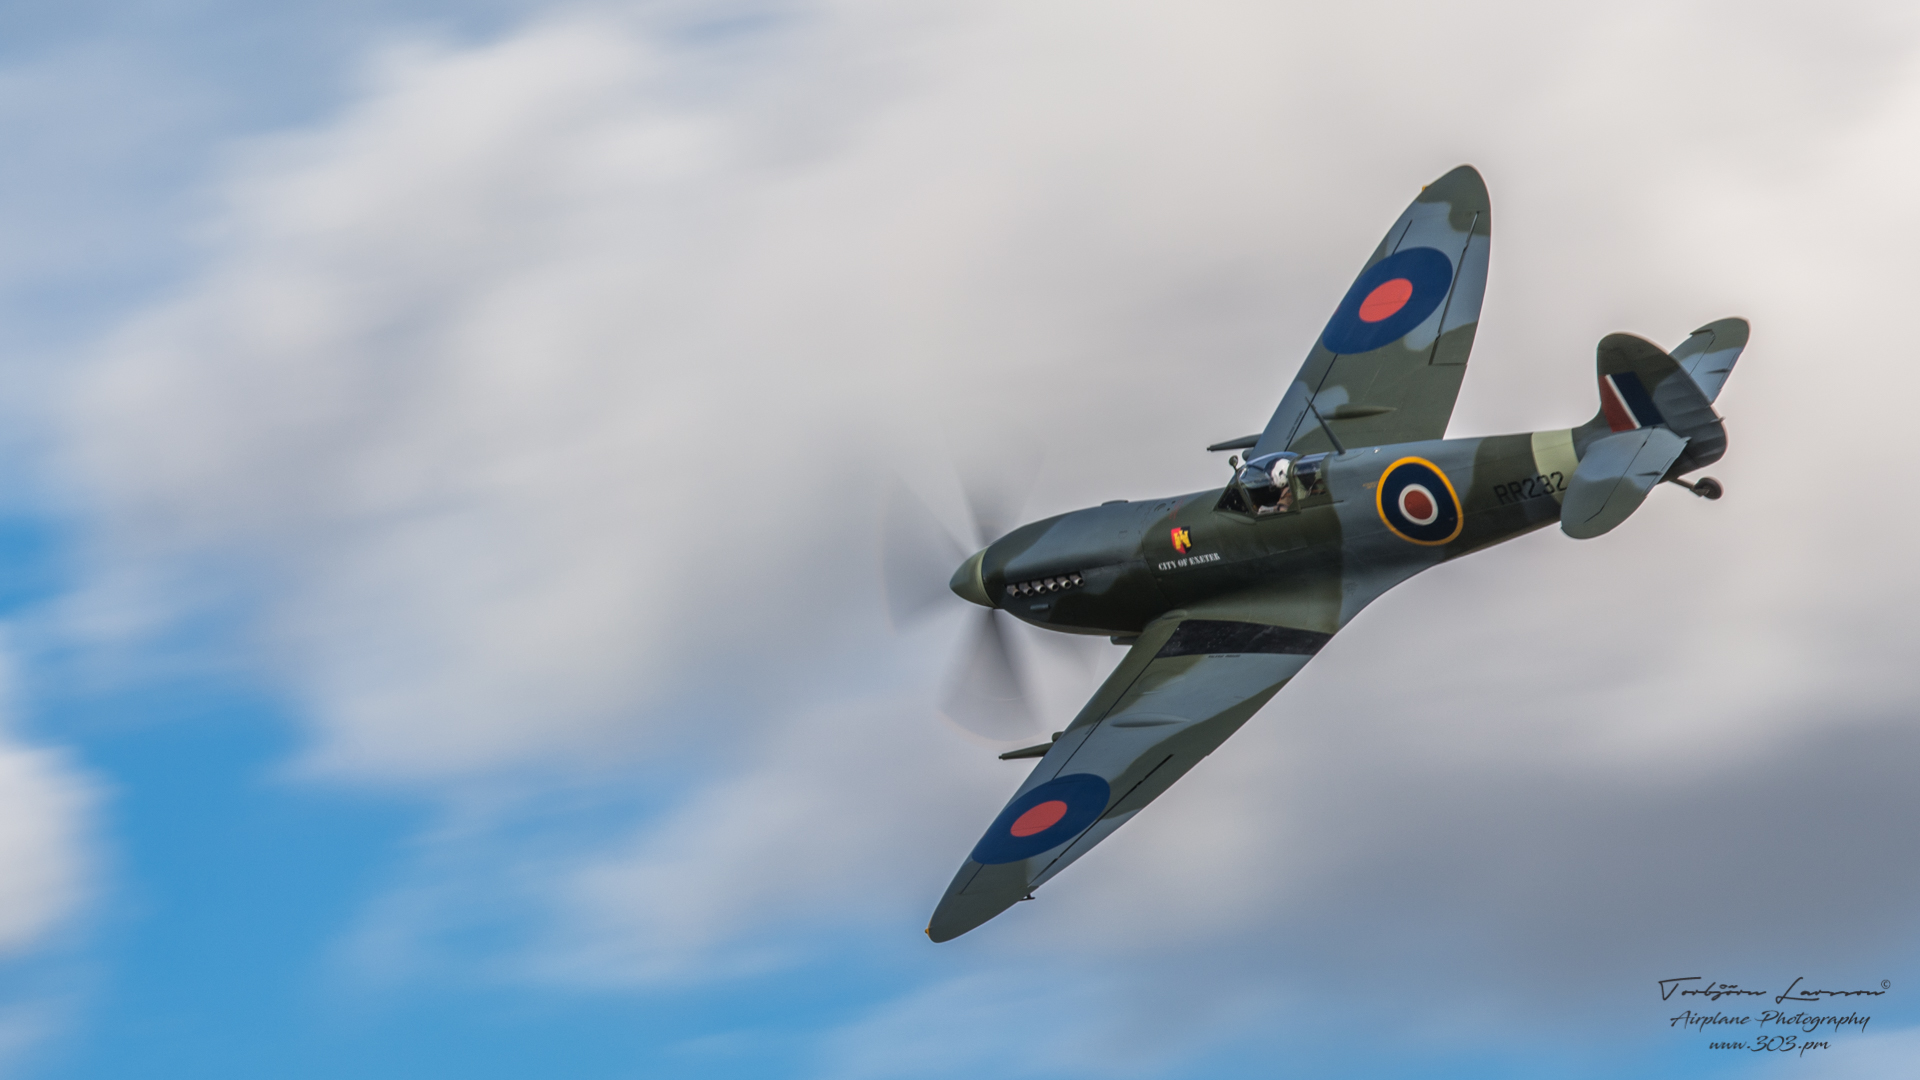 TBE_3088-Vickers Supermarine Spitfire Mk. IX